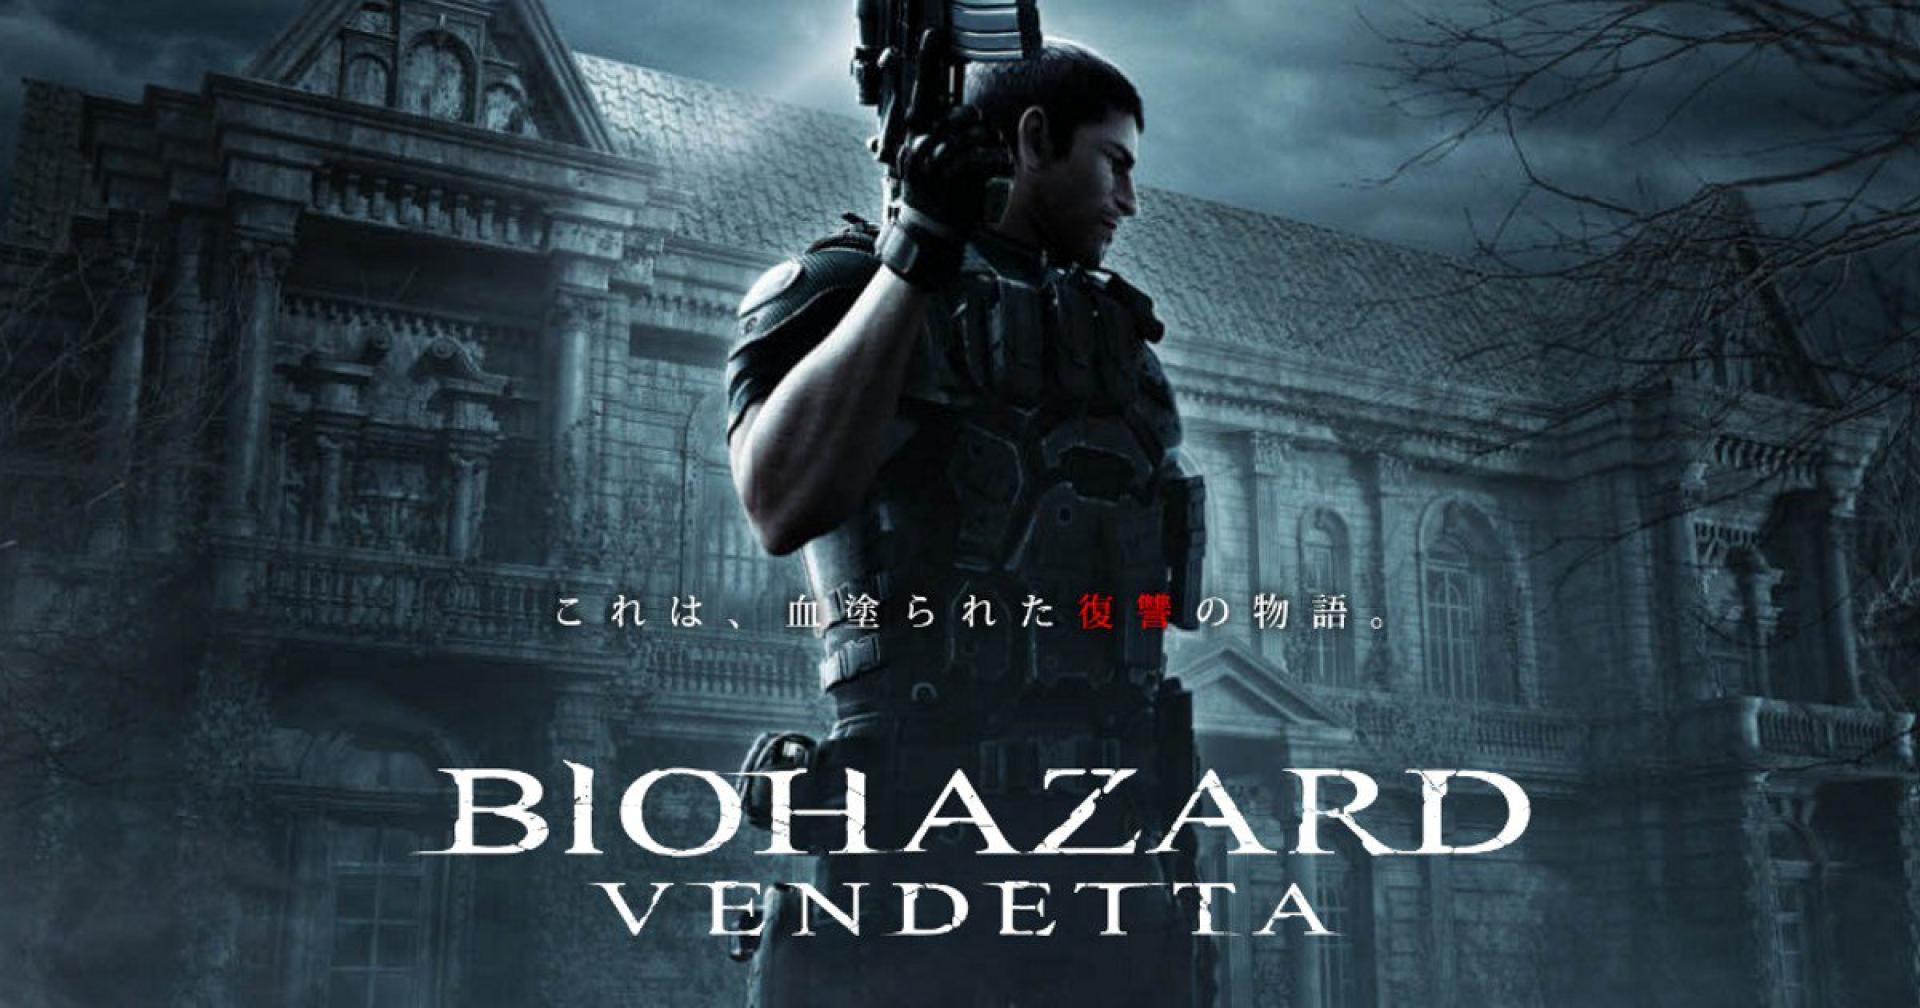 Resident Evil/Biohazard: Vendetta - A kaptár: Vendetta (2017)